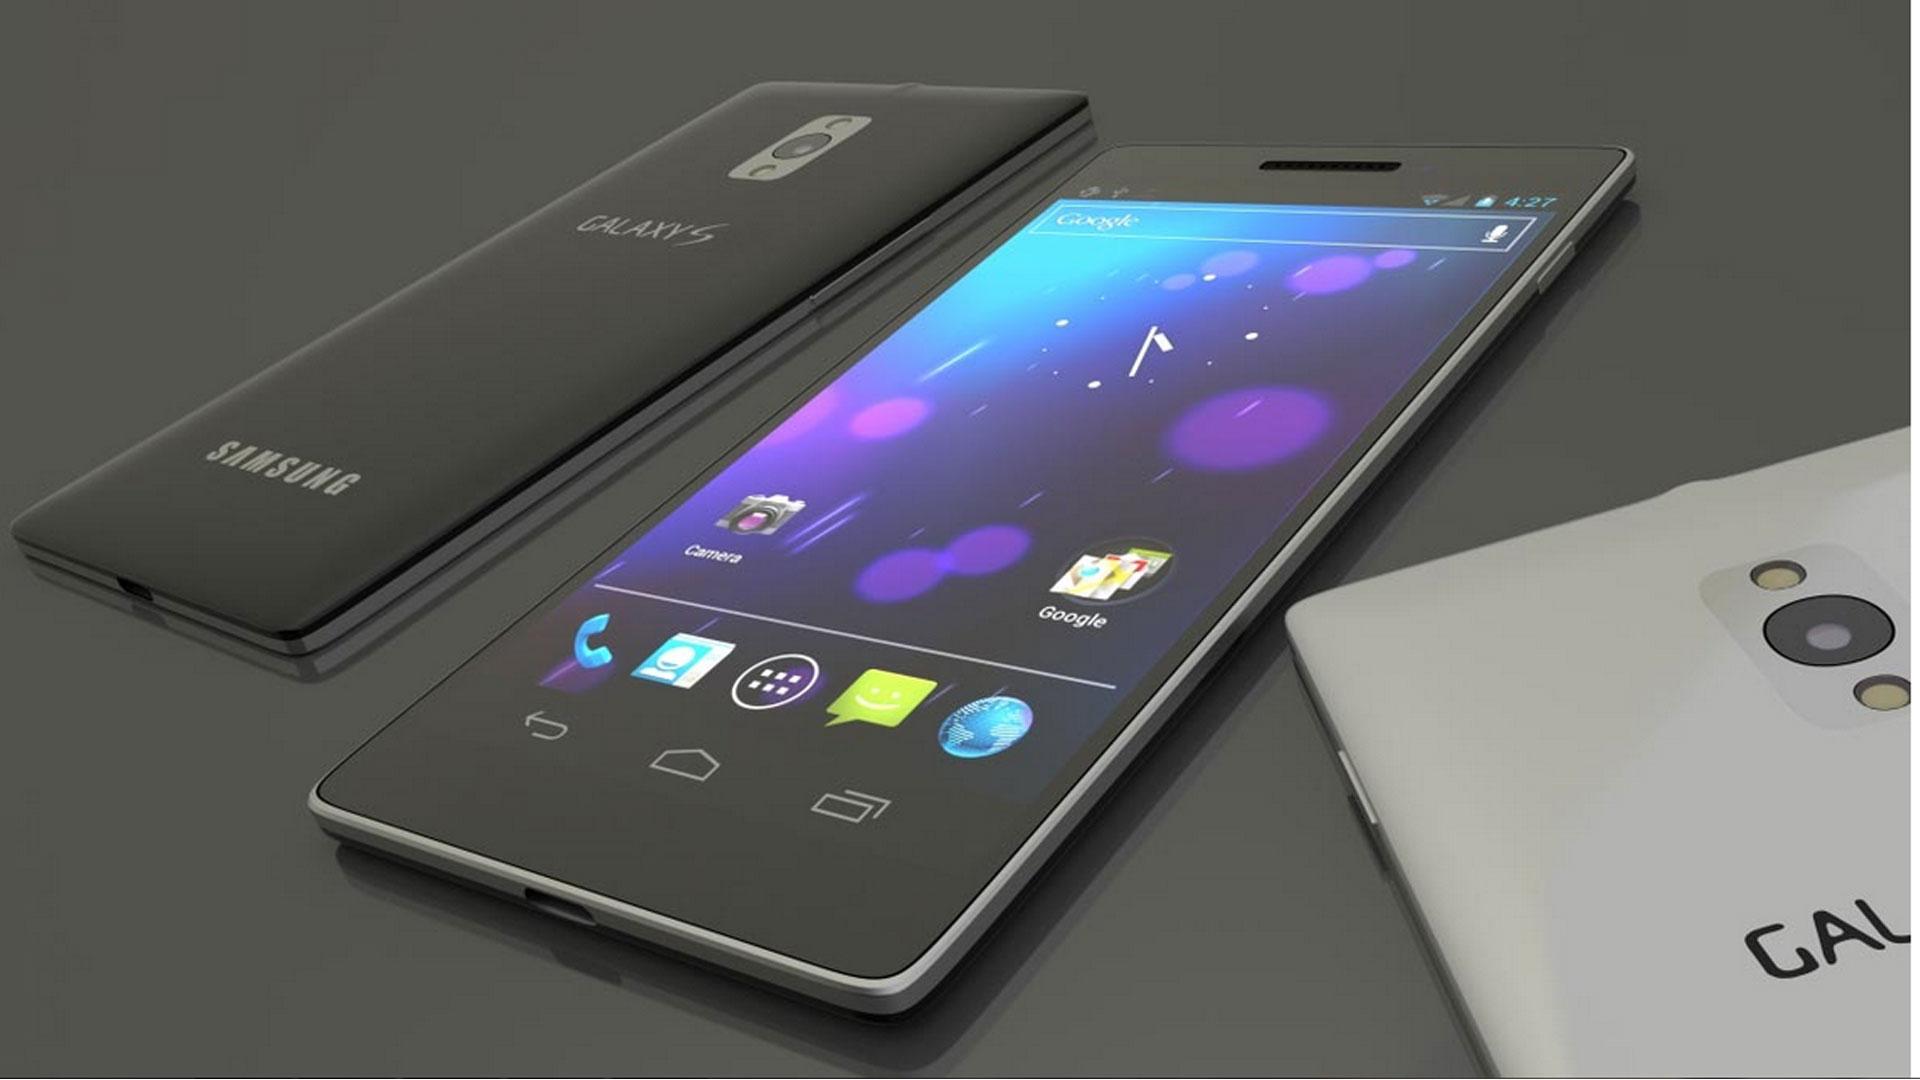 Slims Samsung Galaxy S3 - Slims Samsung Galaxy S3